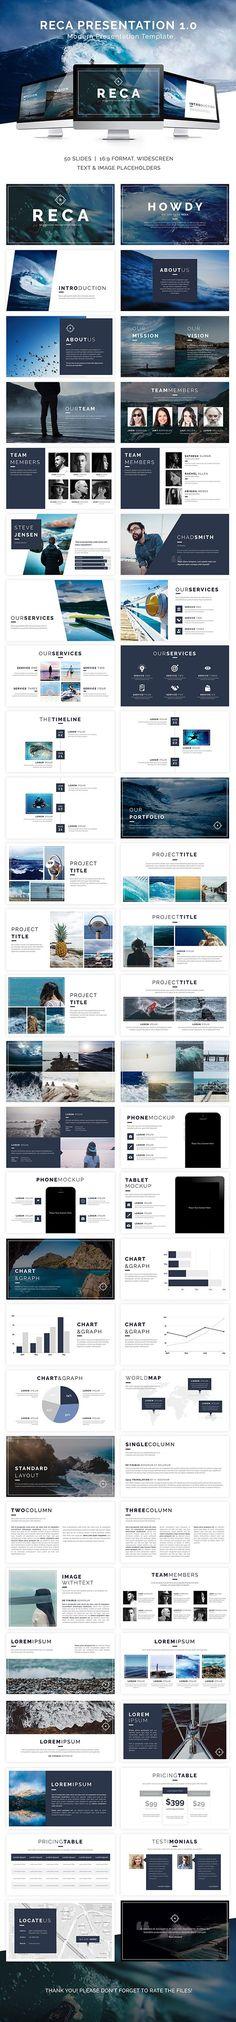 Reca Modern #Google #Slide #Presentation Template - Google Slides Presentation Templates